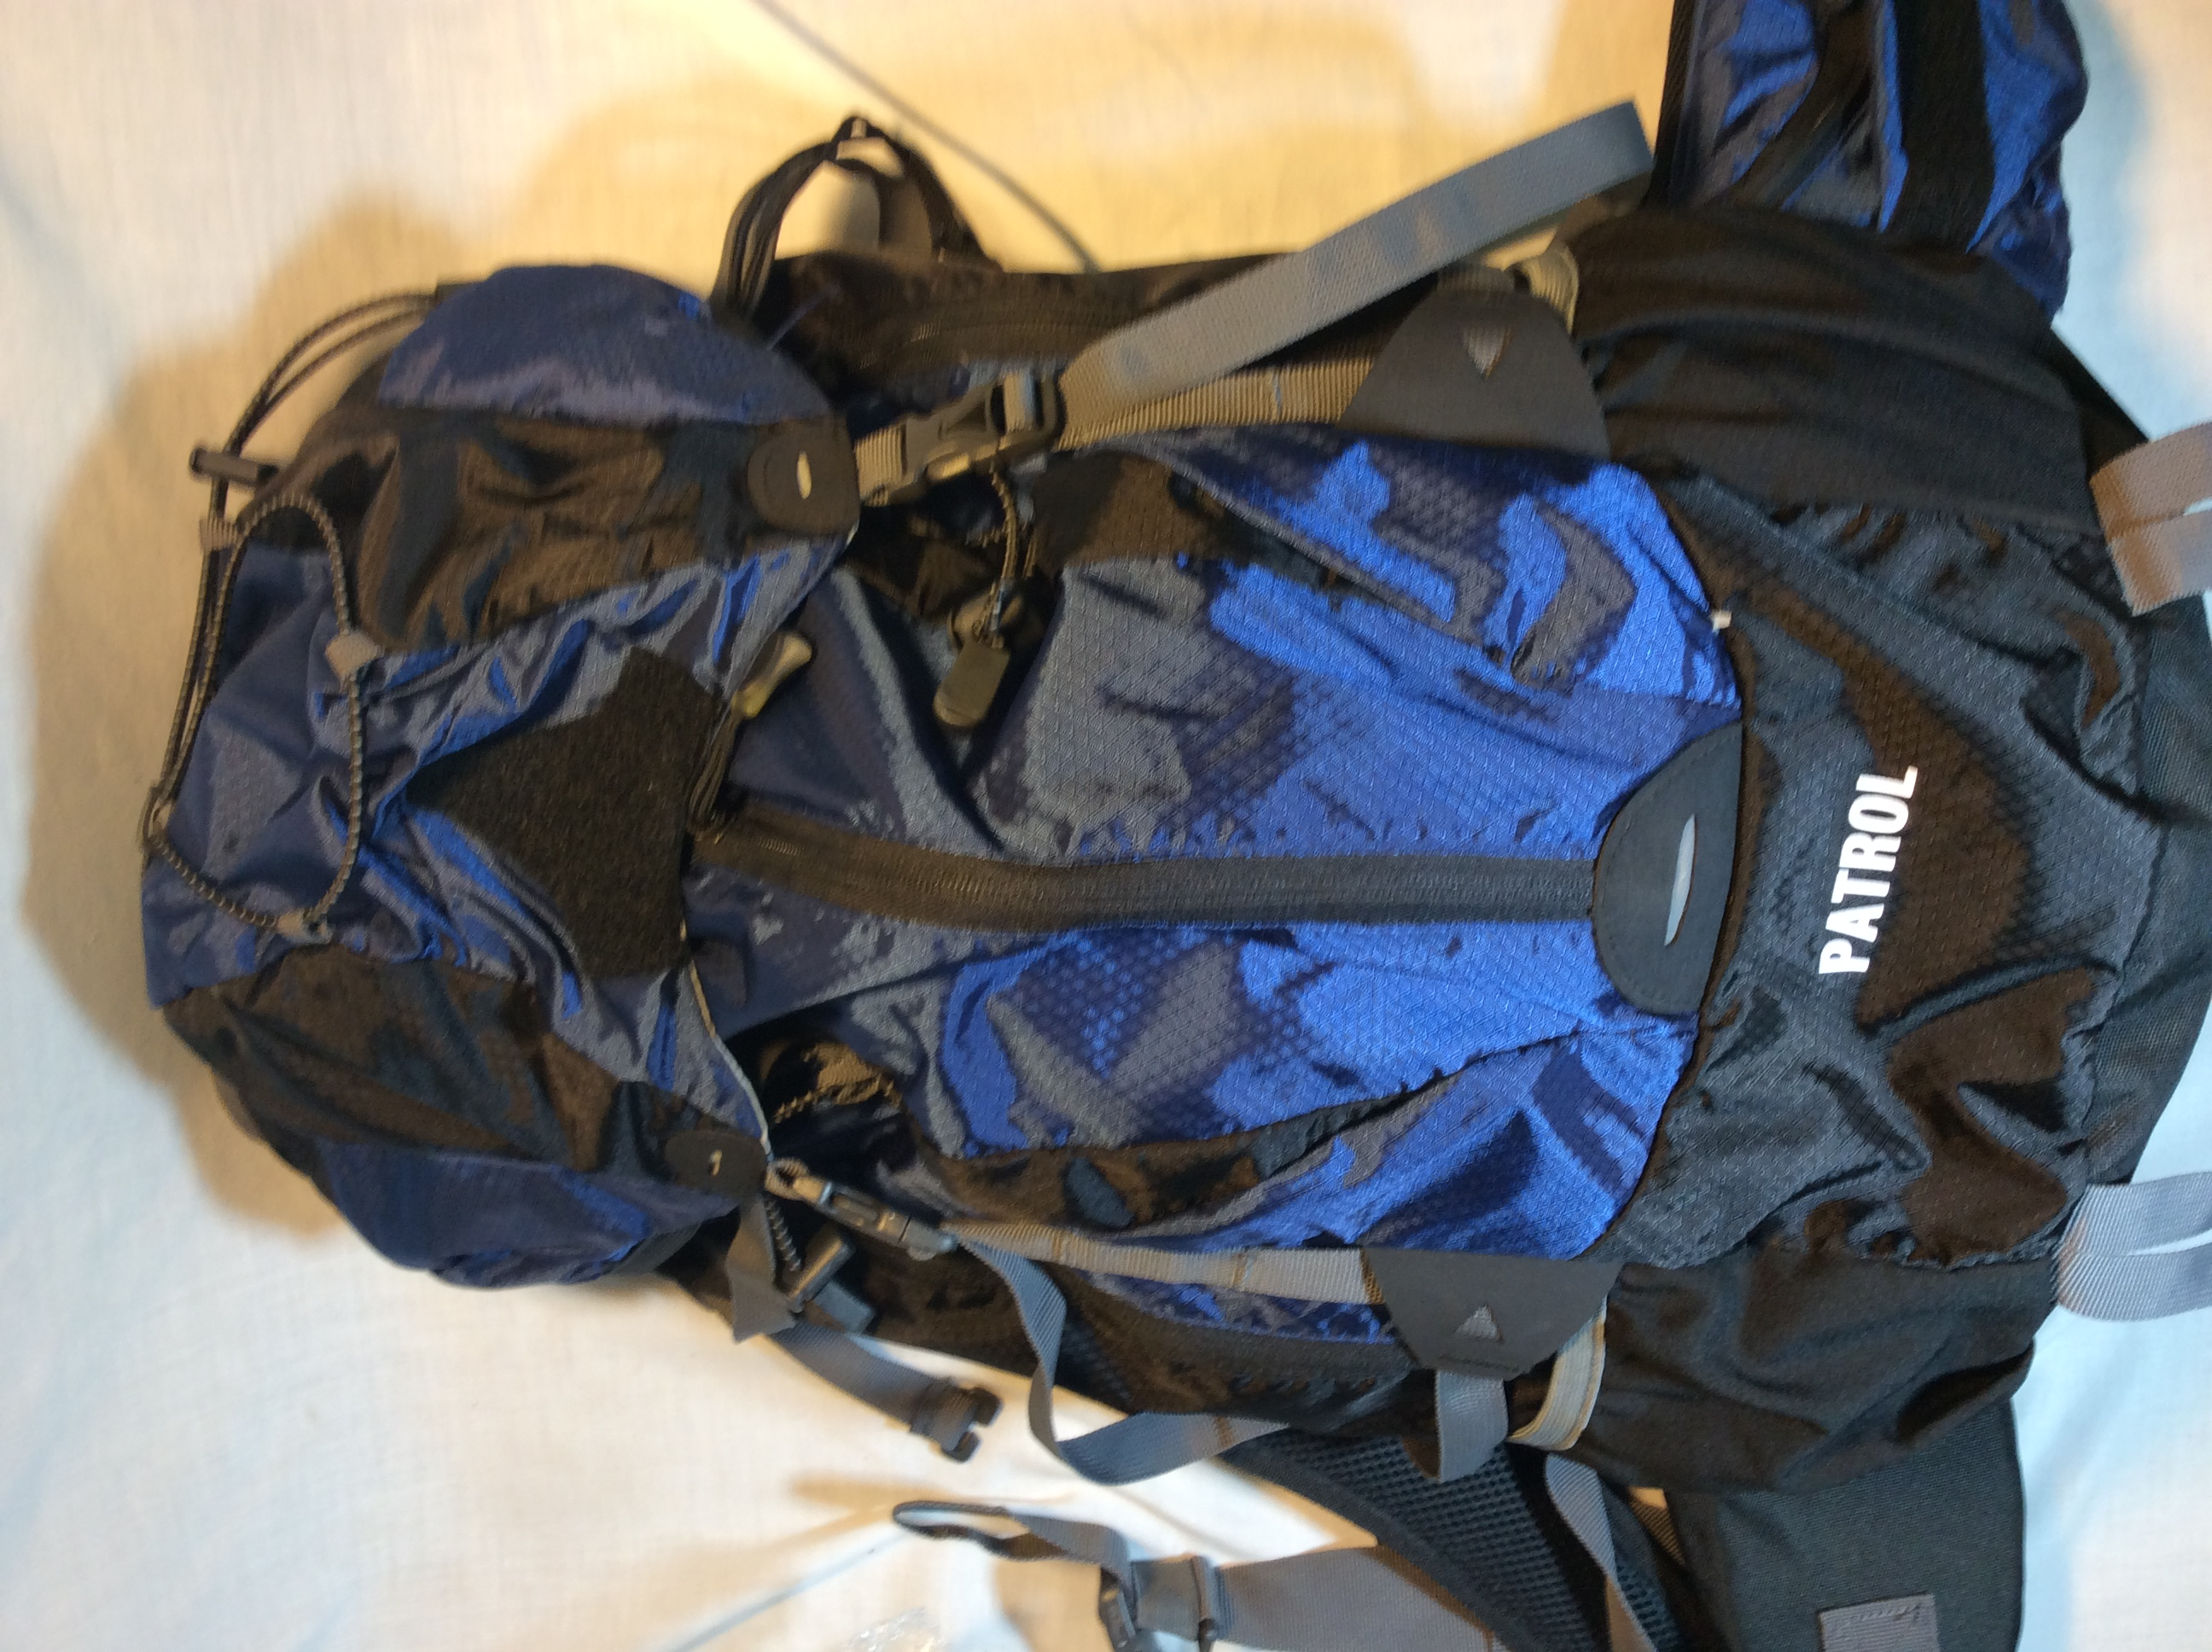 Blue backpack with Patrol markings